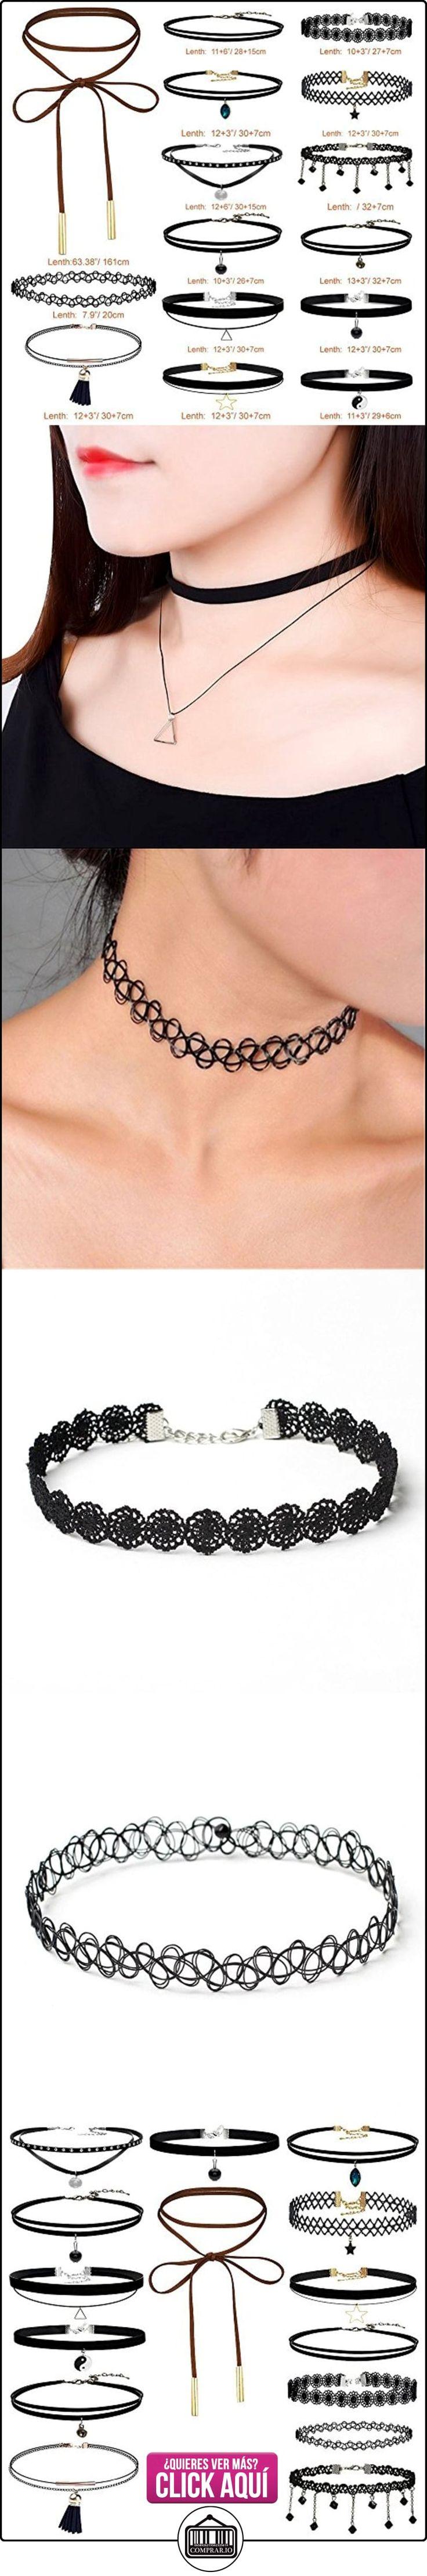 Longra 15 piezas de collar de estrangulación Set Stretch Velvet Classic Gothic Tattoo Lace Choker  ✿ Joyas para mujer - Las mejores ofertas ✿ ▬► Ver oferta: https://comprar.io/goto/B01NCNY5YF